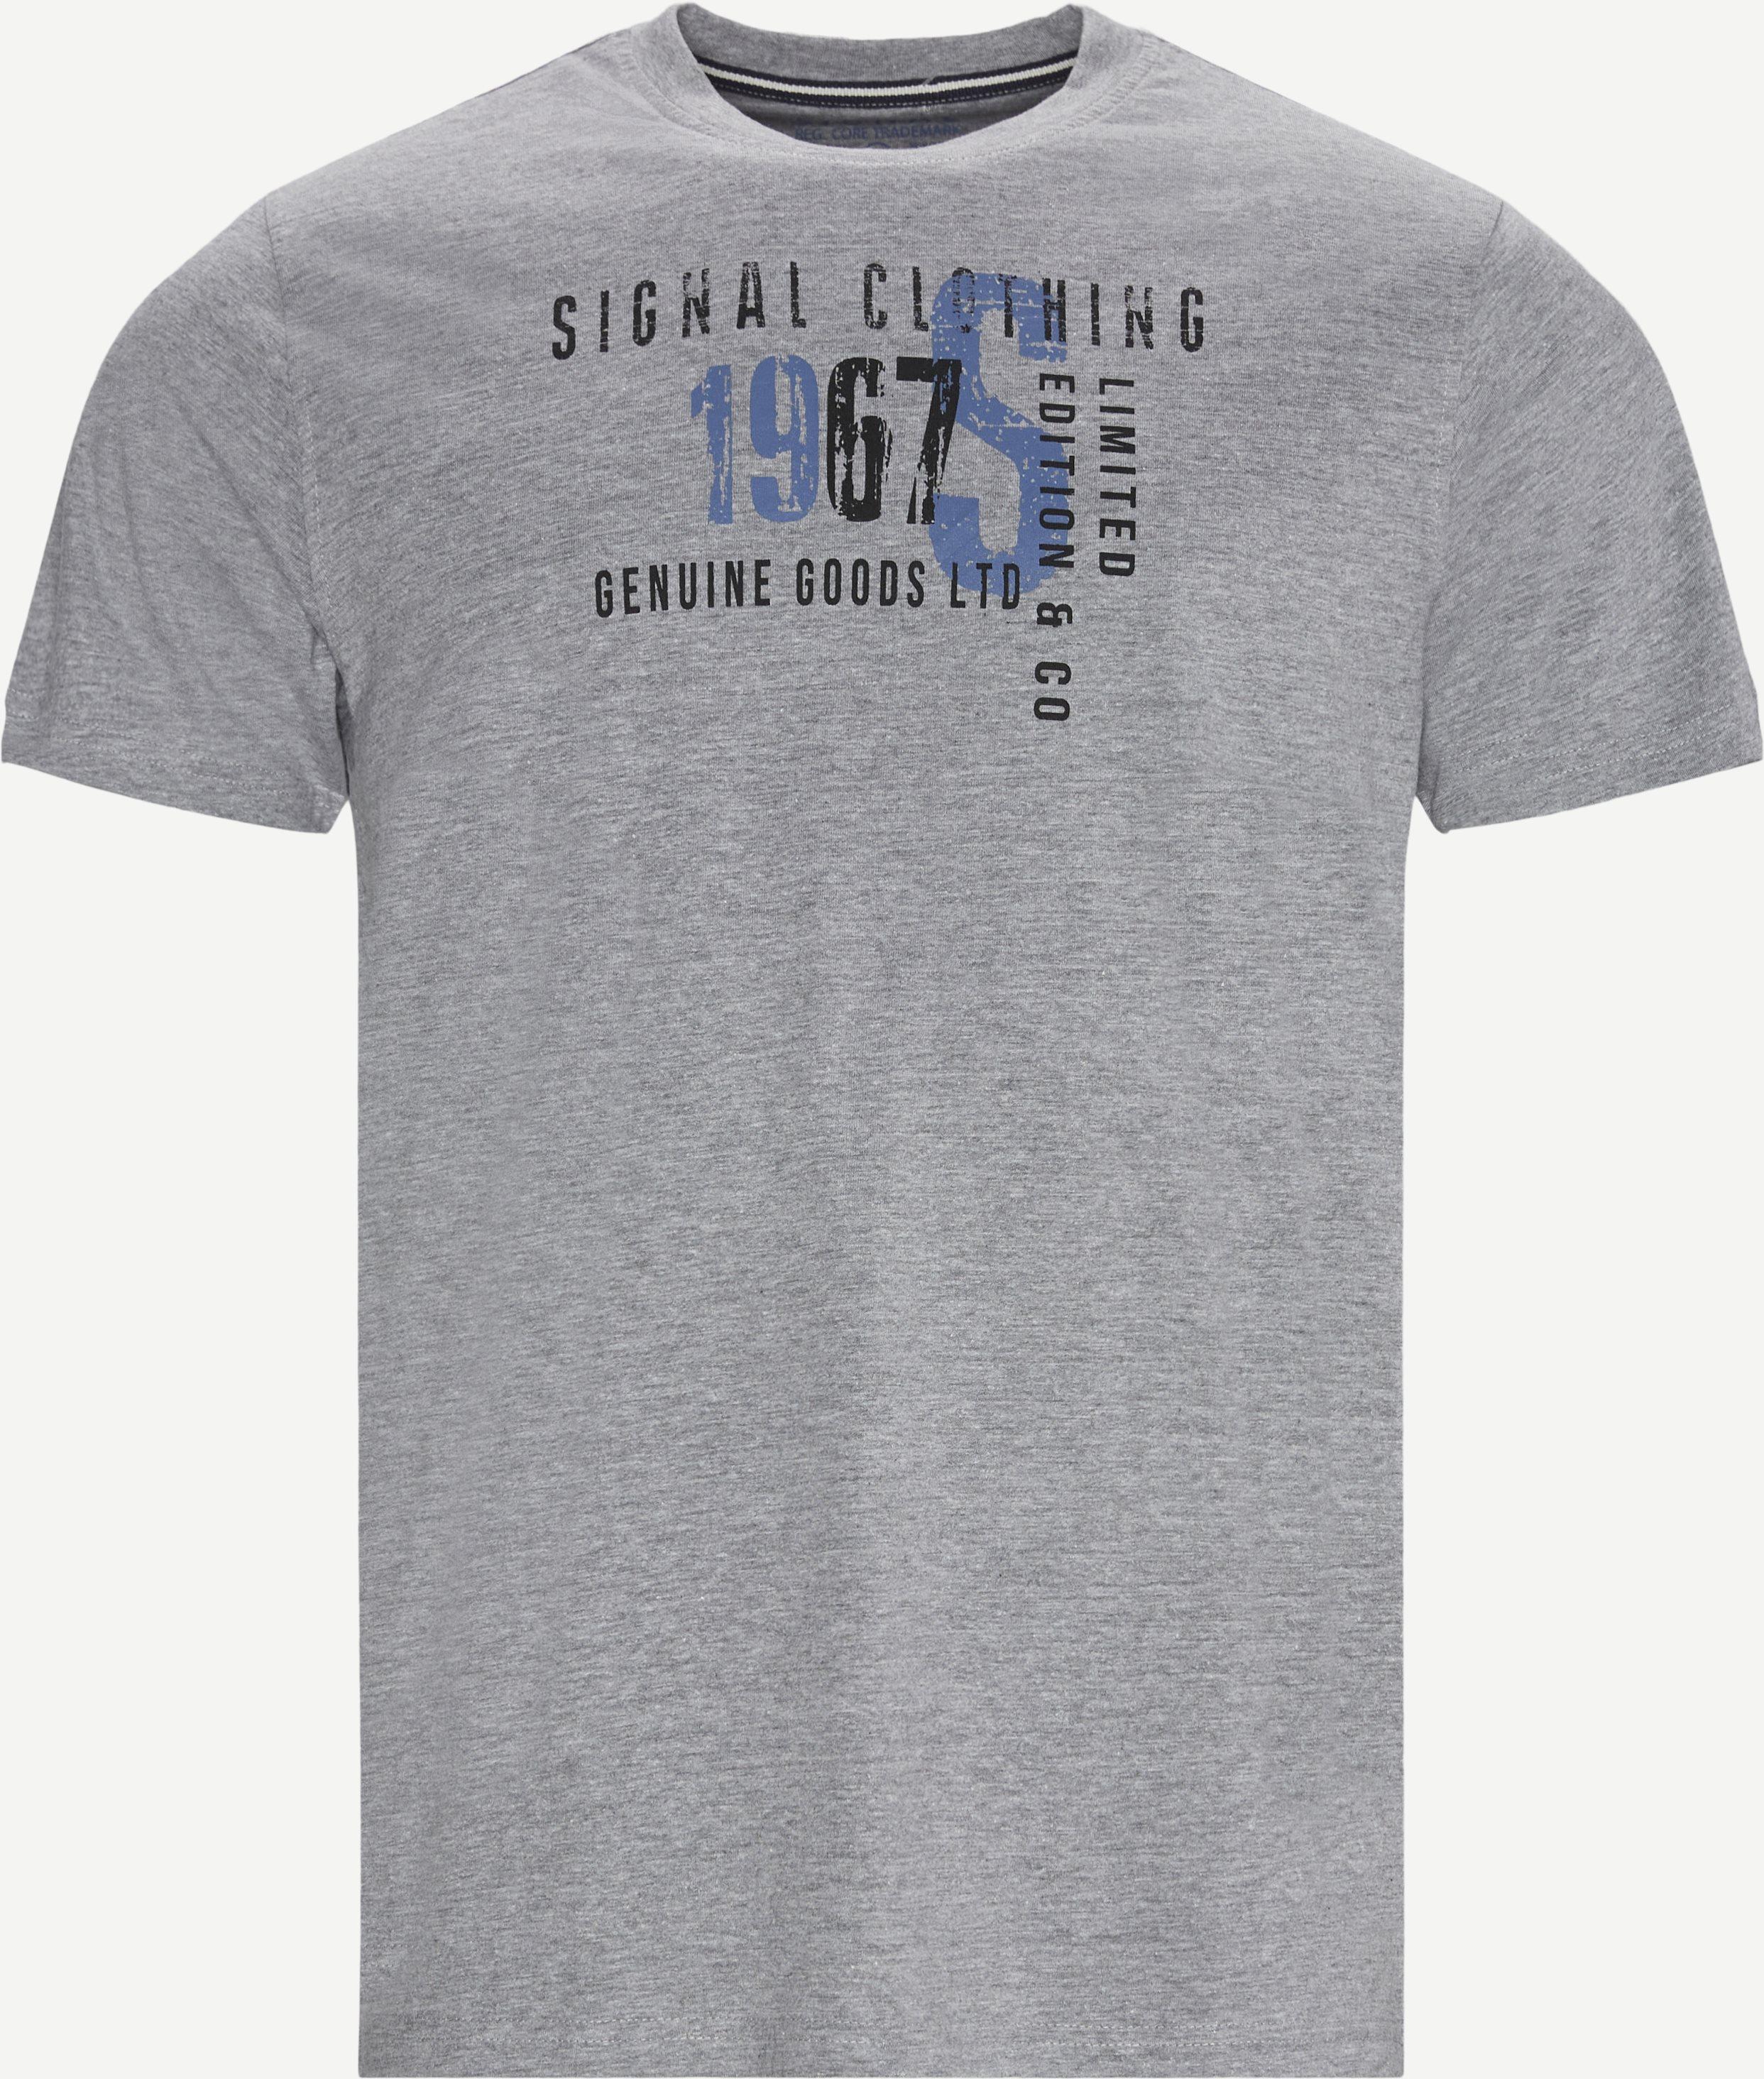 T-Shirts - Regular fit - Grau